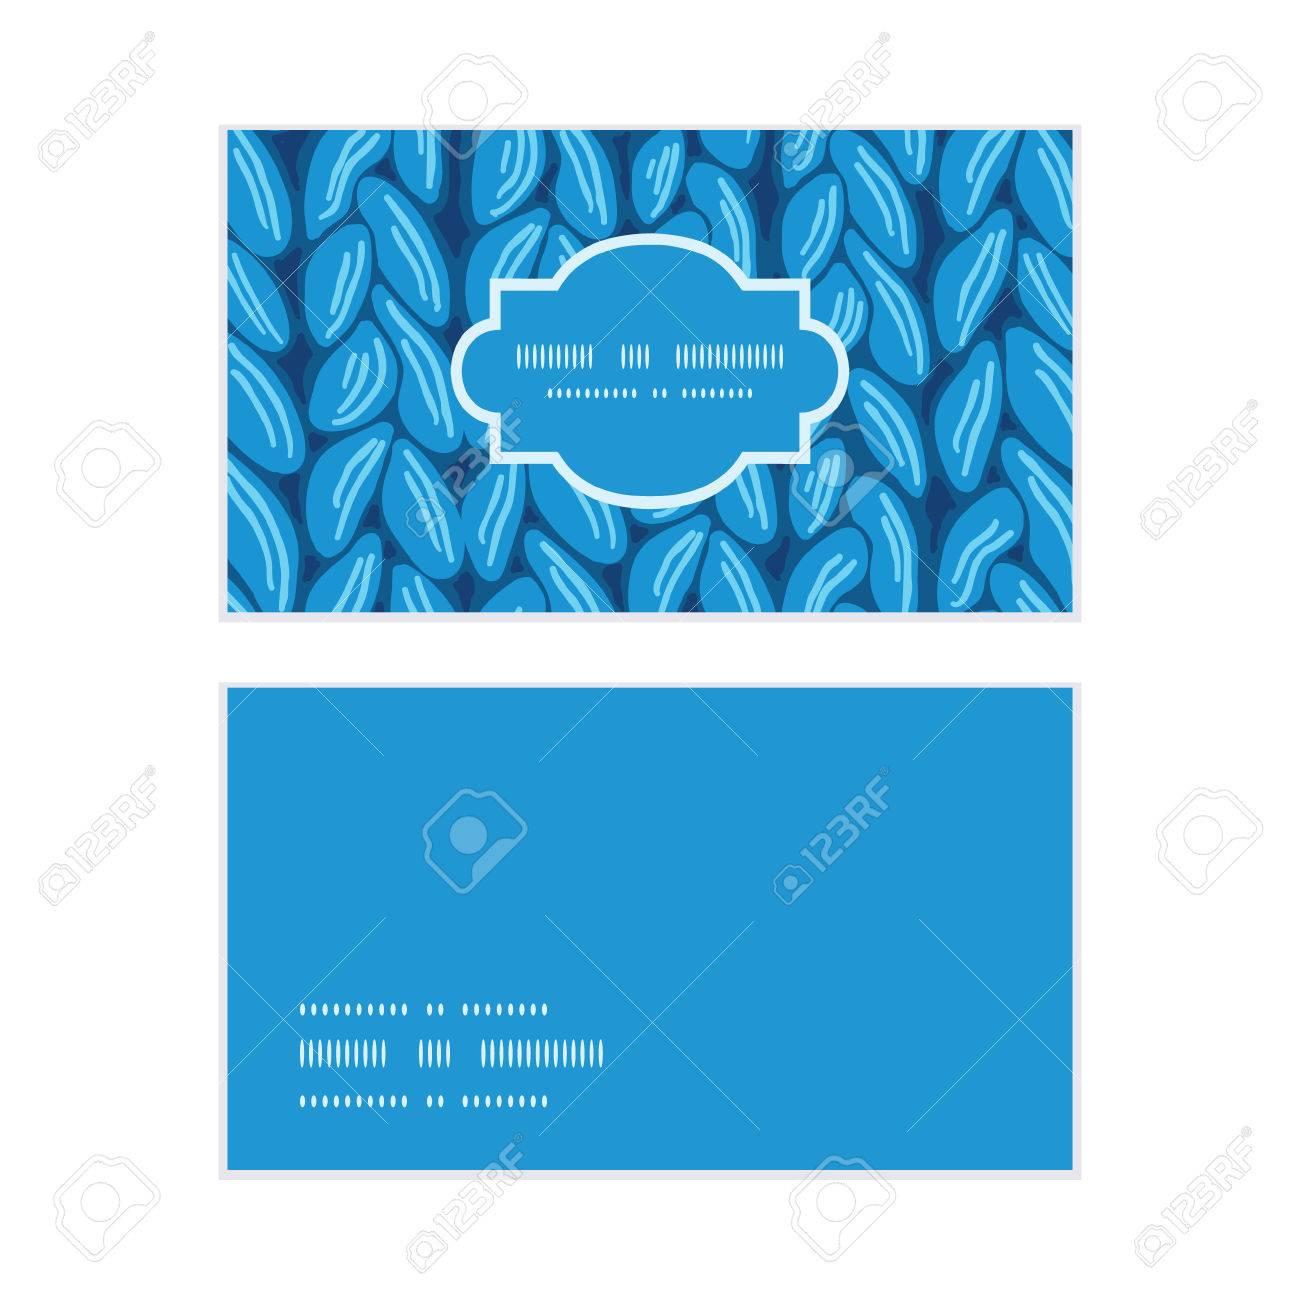 Vector knit sewater fabric horizontal texture horizontal frame vector vector knit sewater fabric horizontal texture horizontal frame pattern business cards set colourmoves